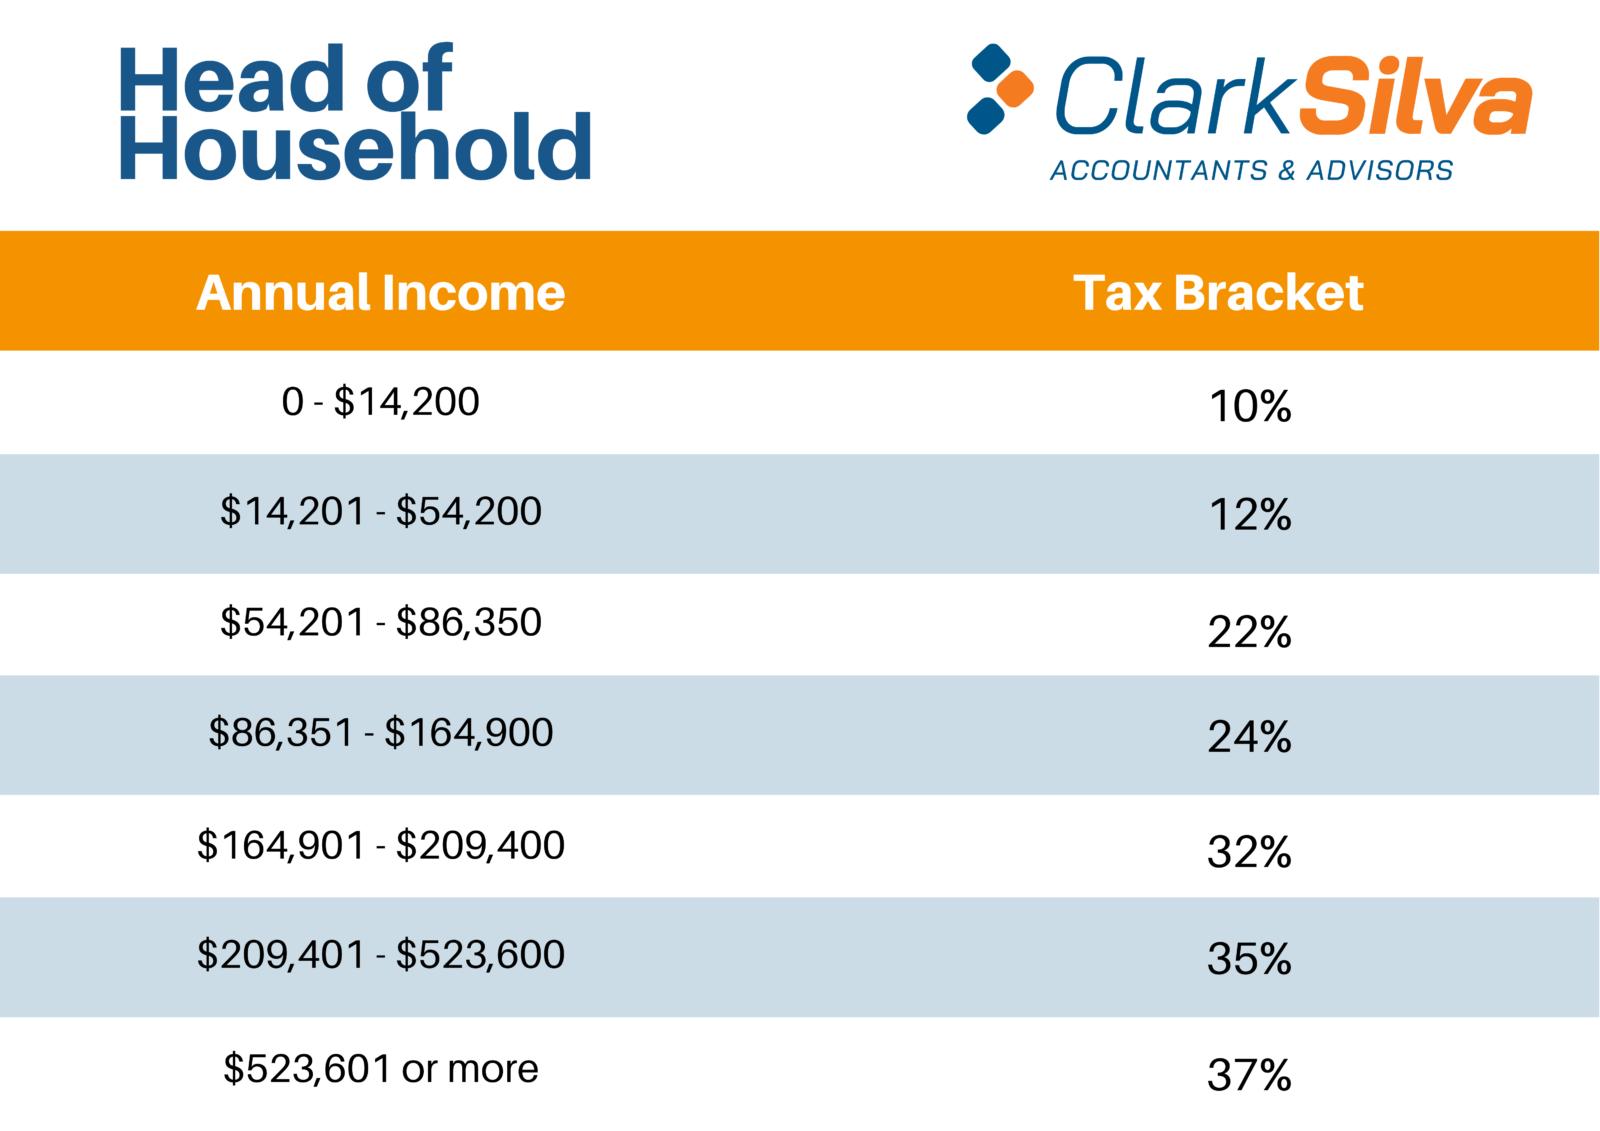 2021 Tax Bracket - Head of Household